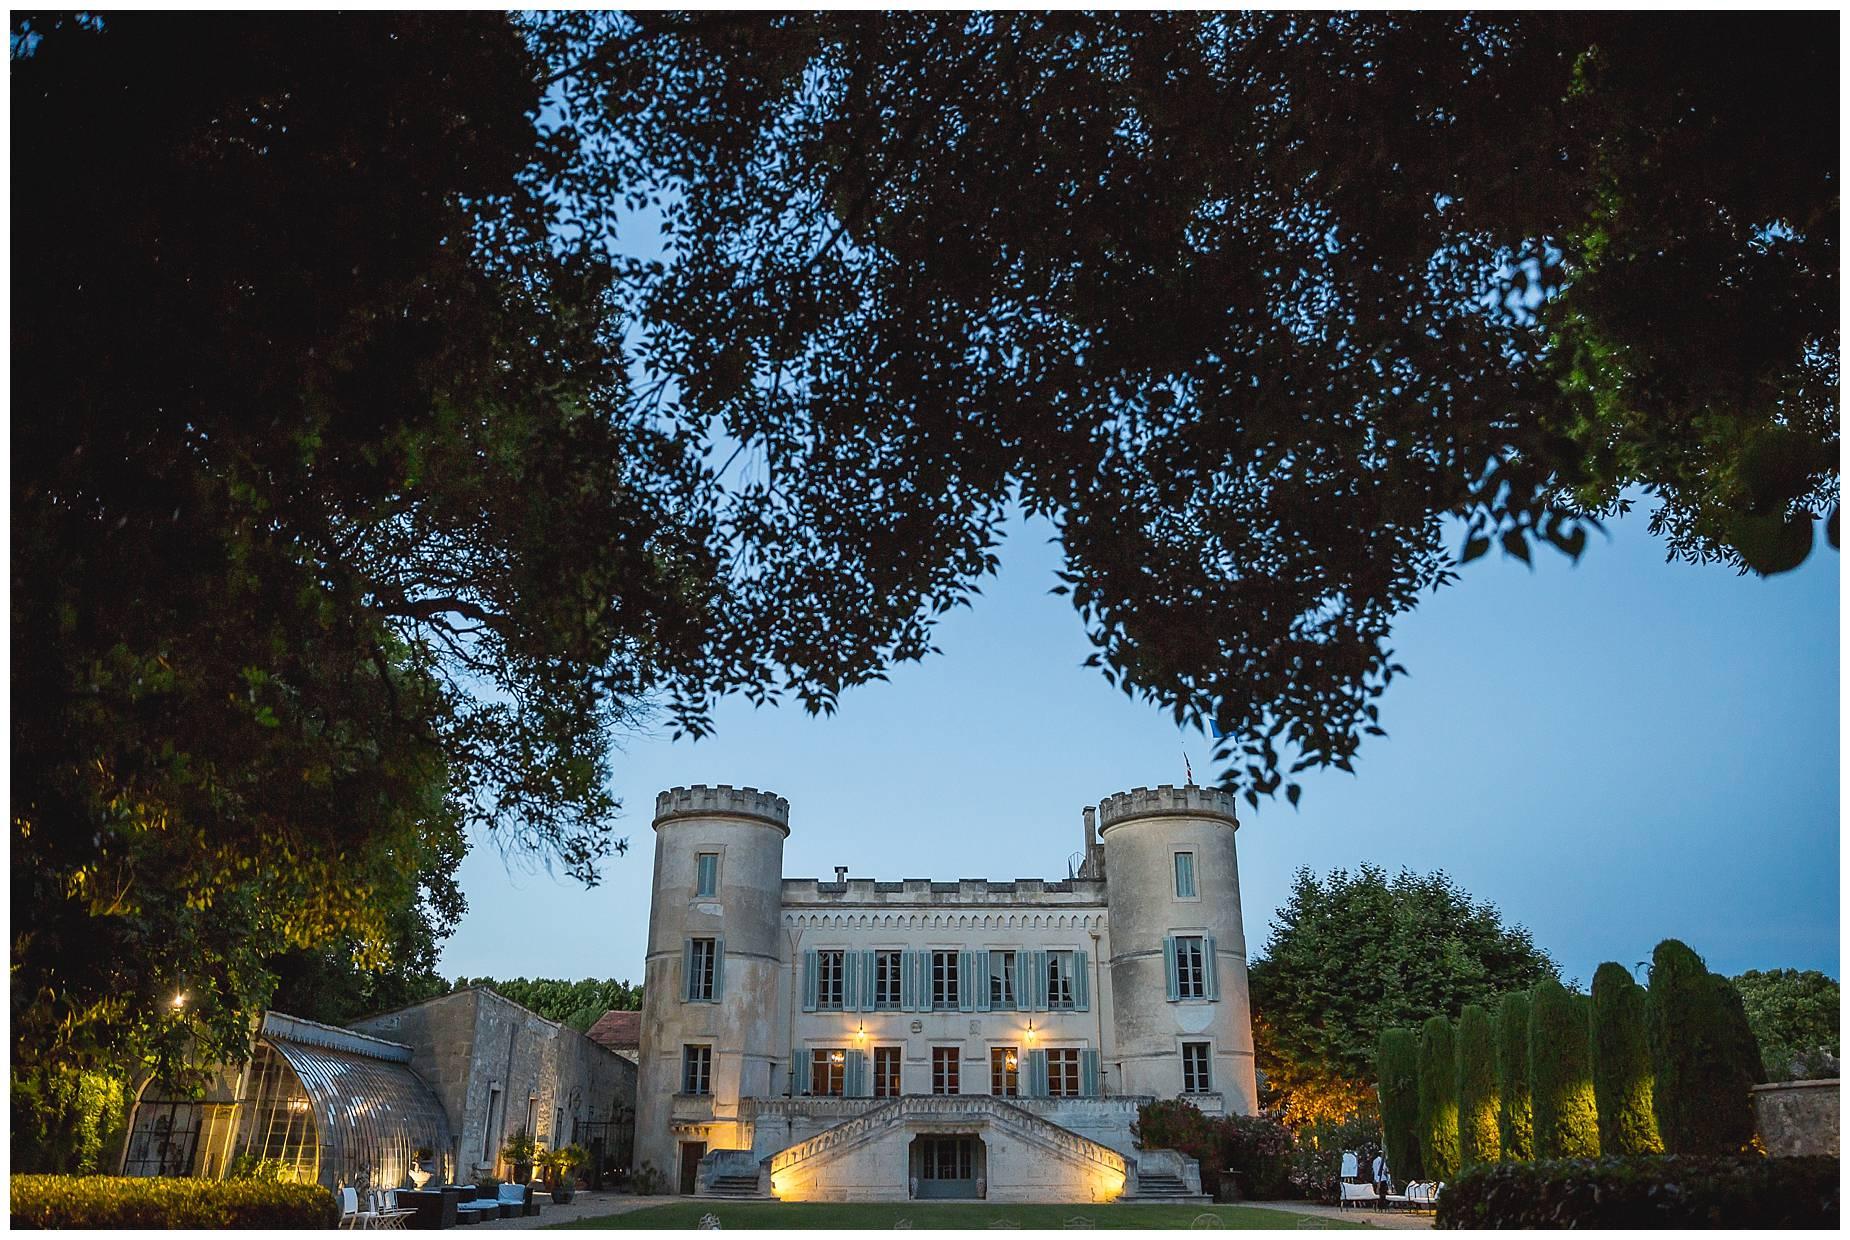 Chateau de Pouget at night